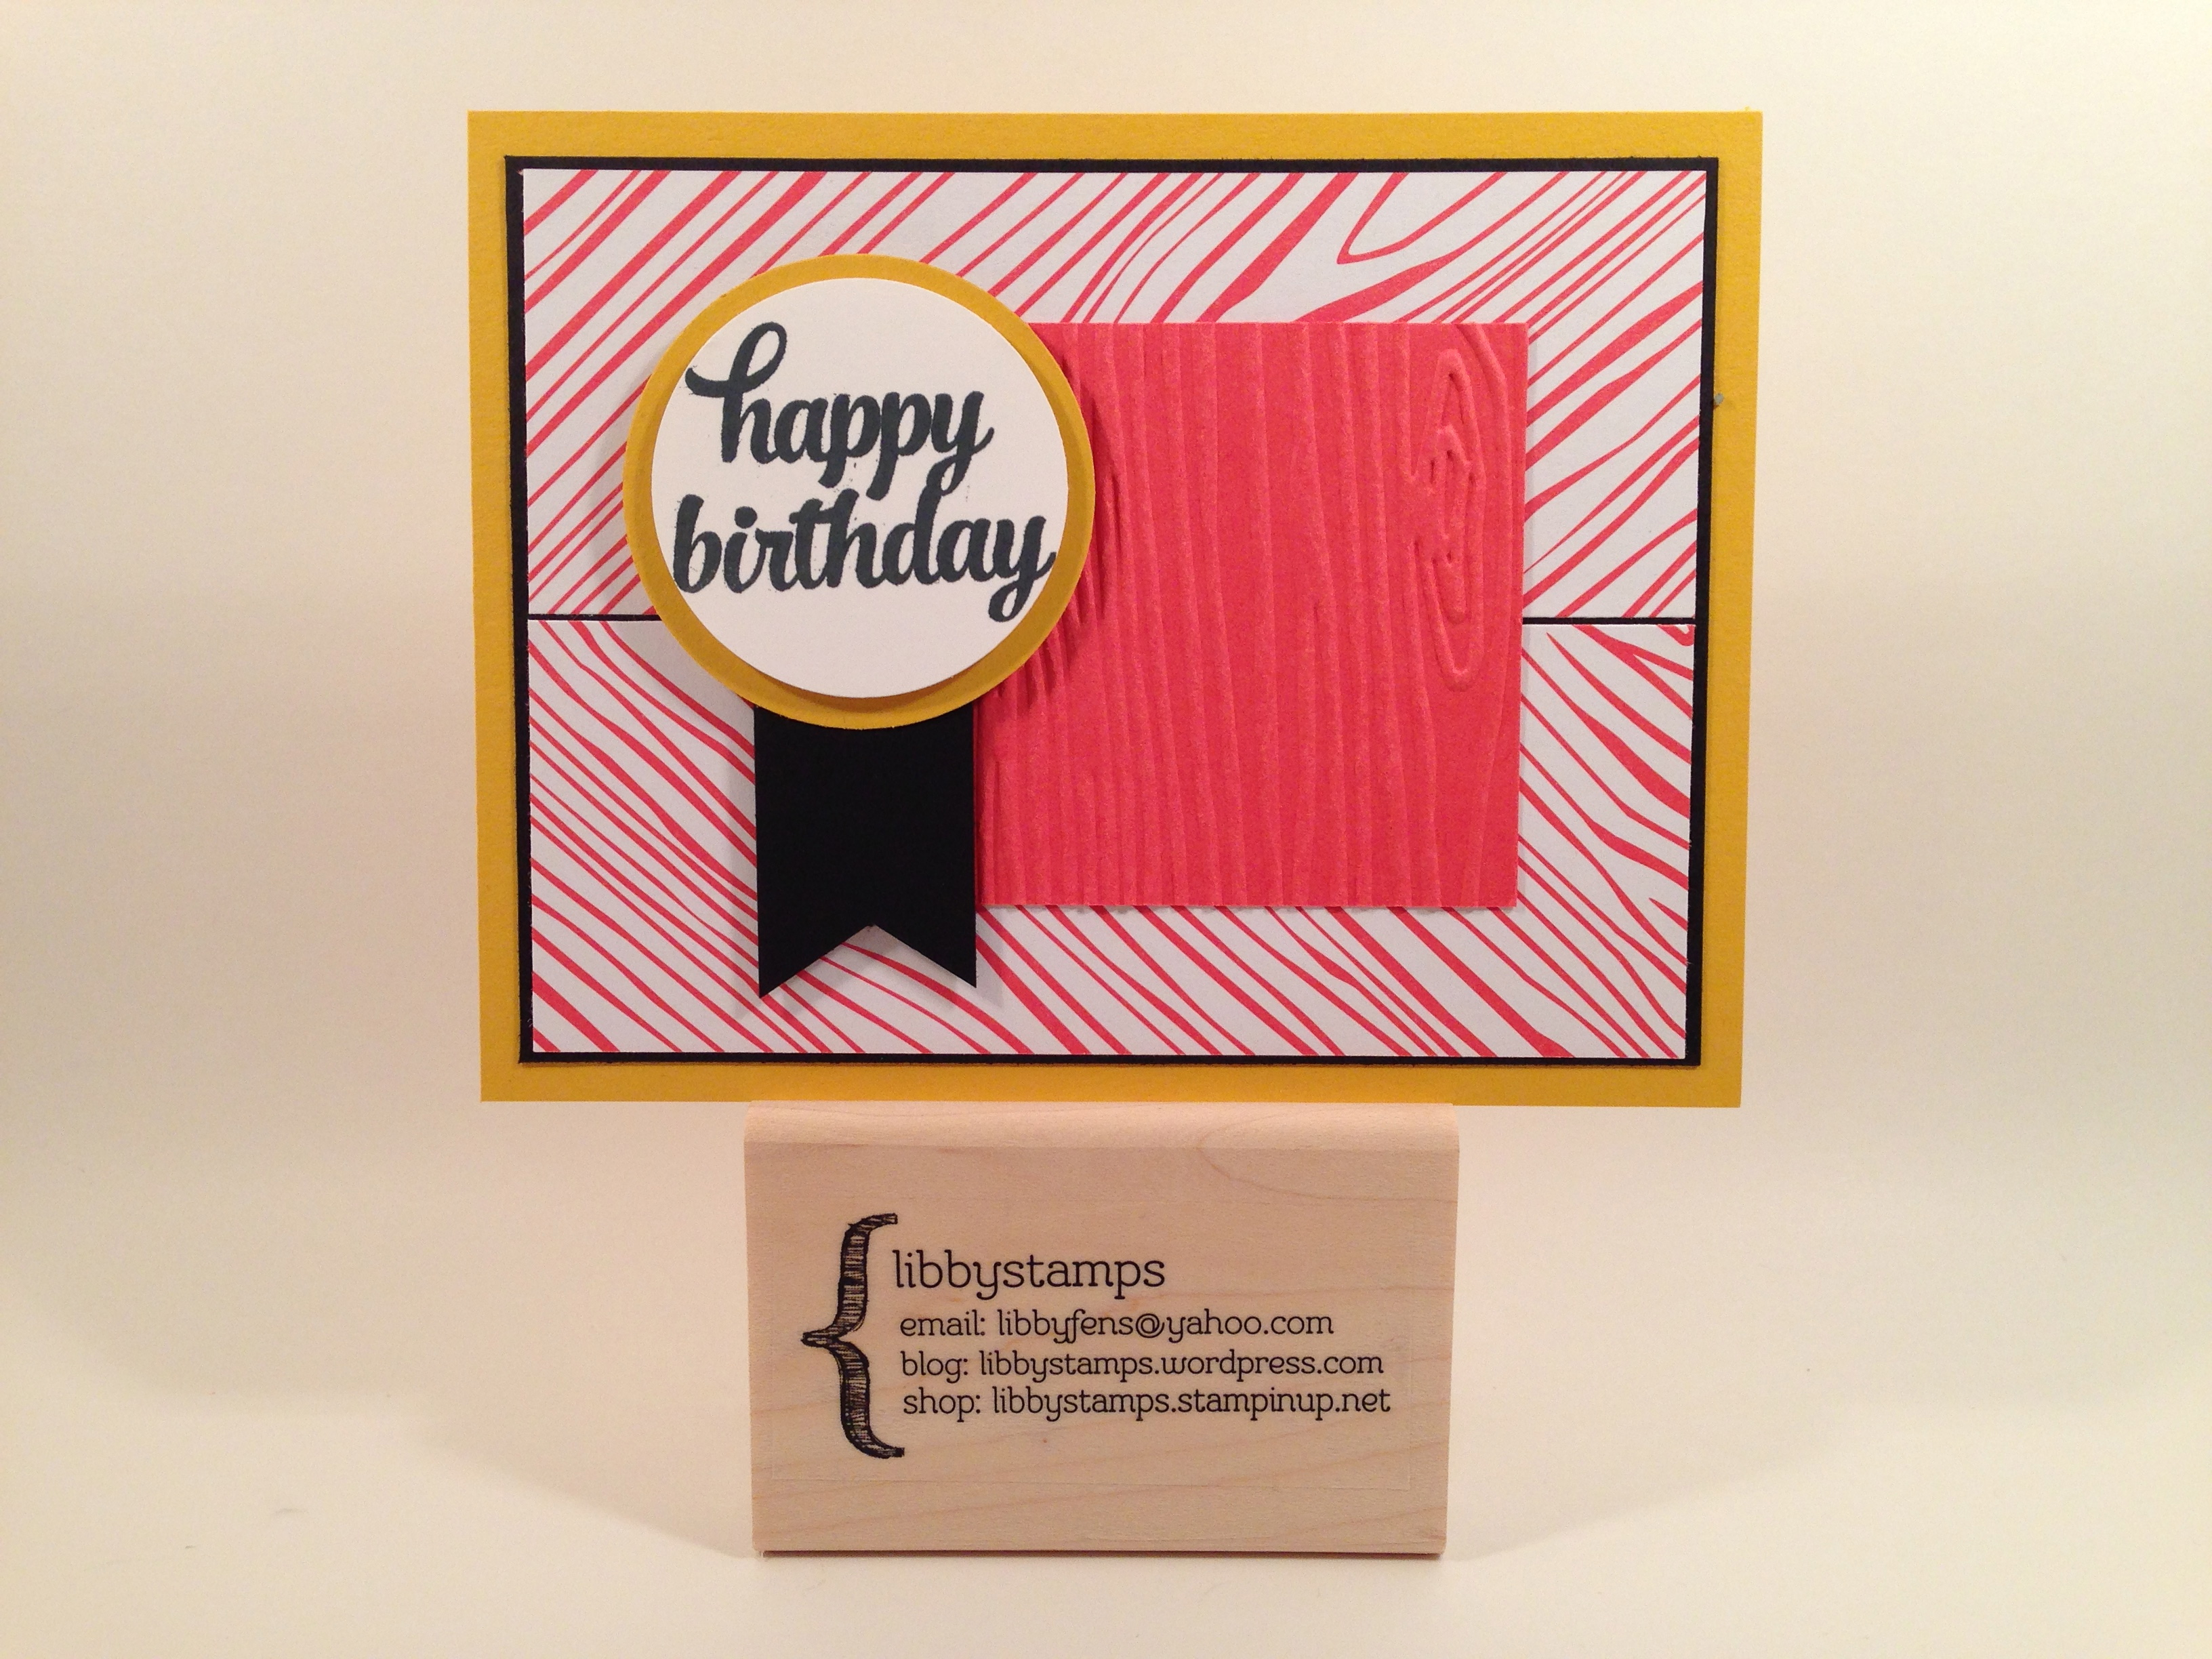 libbystamps, Stampin' Up, stampinup, CCMC364, MS Sketch-081, Tin of Cards Stamp Set, 2015-2017 In Color Envelope Liner Paper, Woodgrain Embossing Folder, Banner Triple Punch,